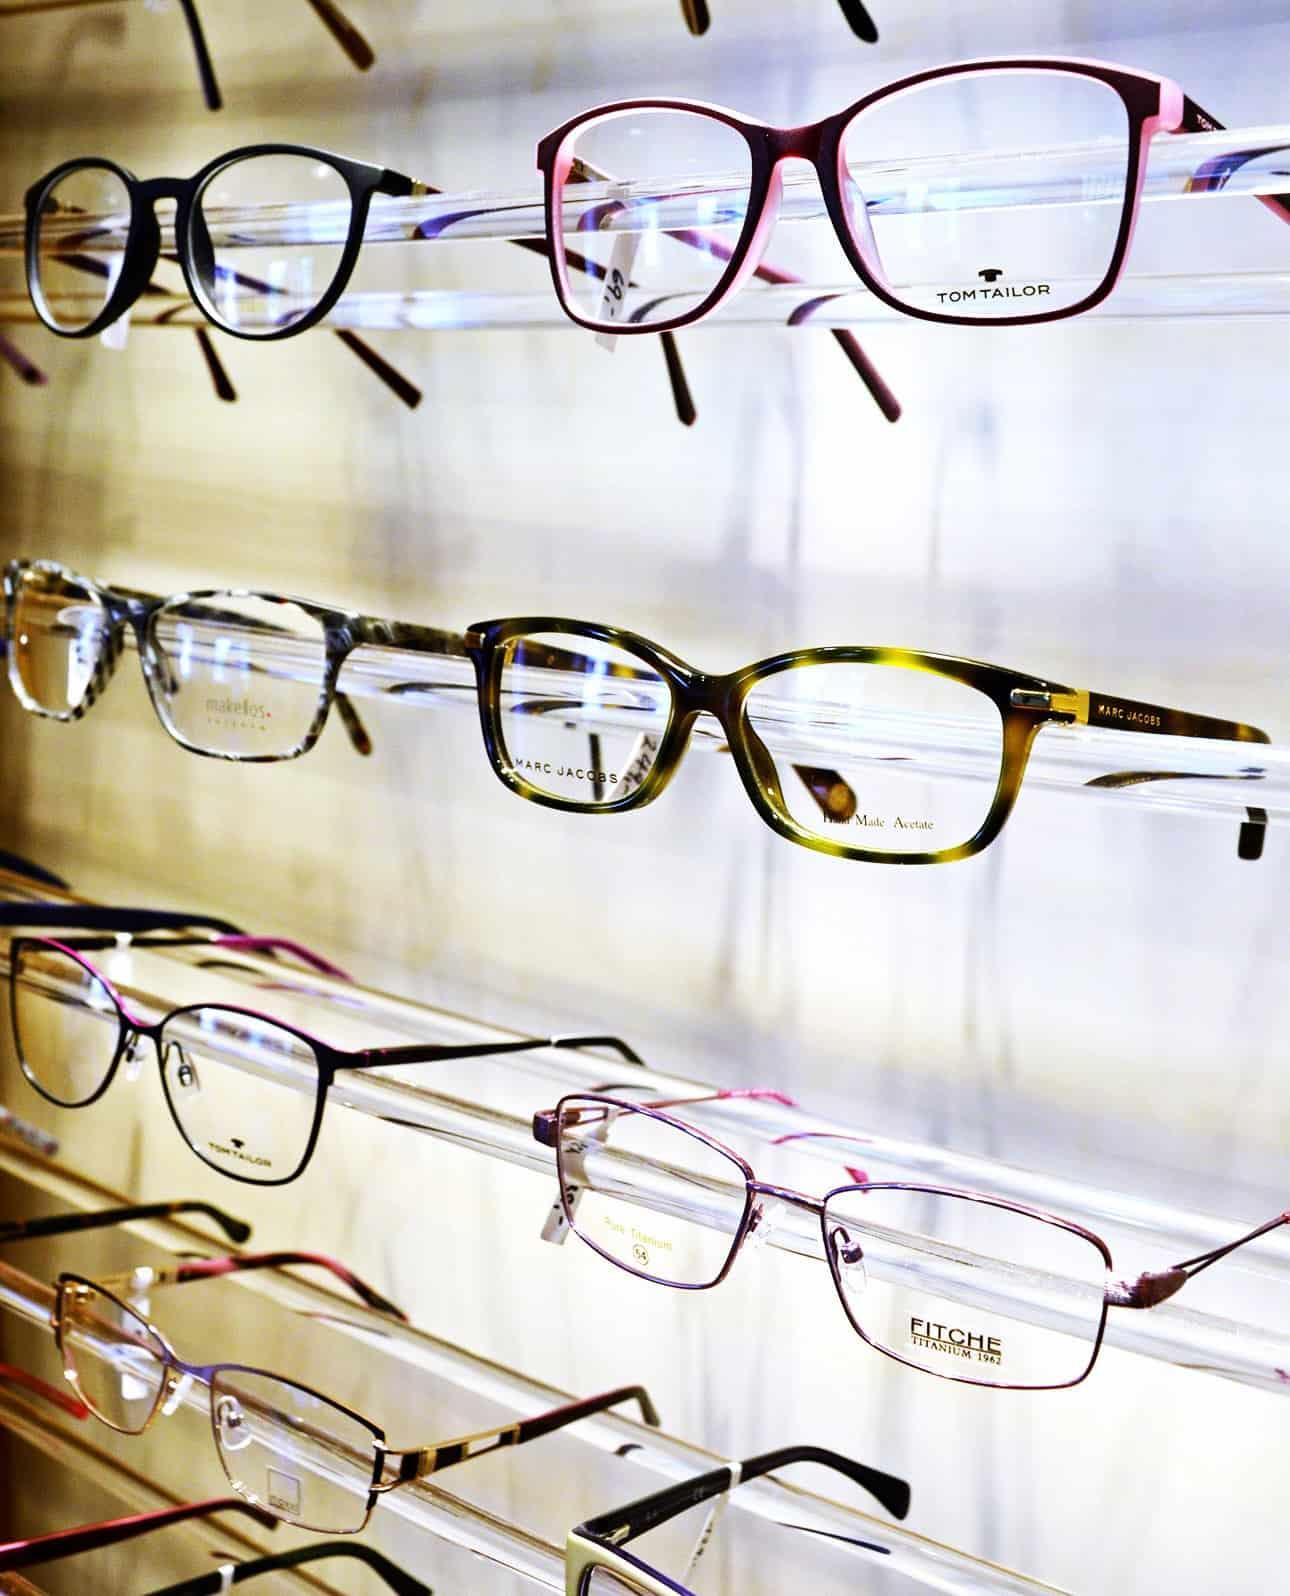 Brillen und Kontaktlinsen Nordheide – rosengarten-optik